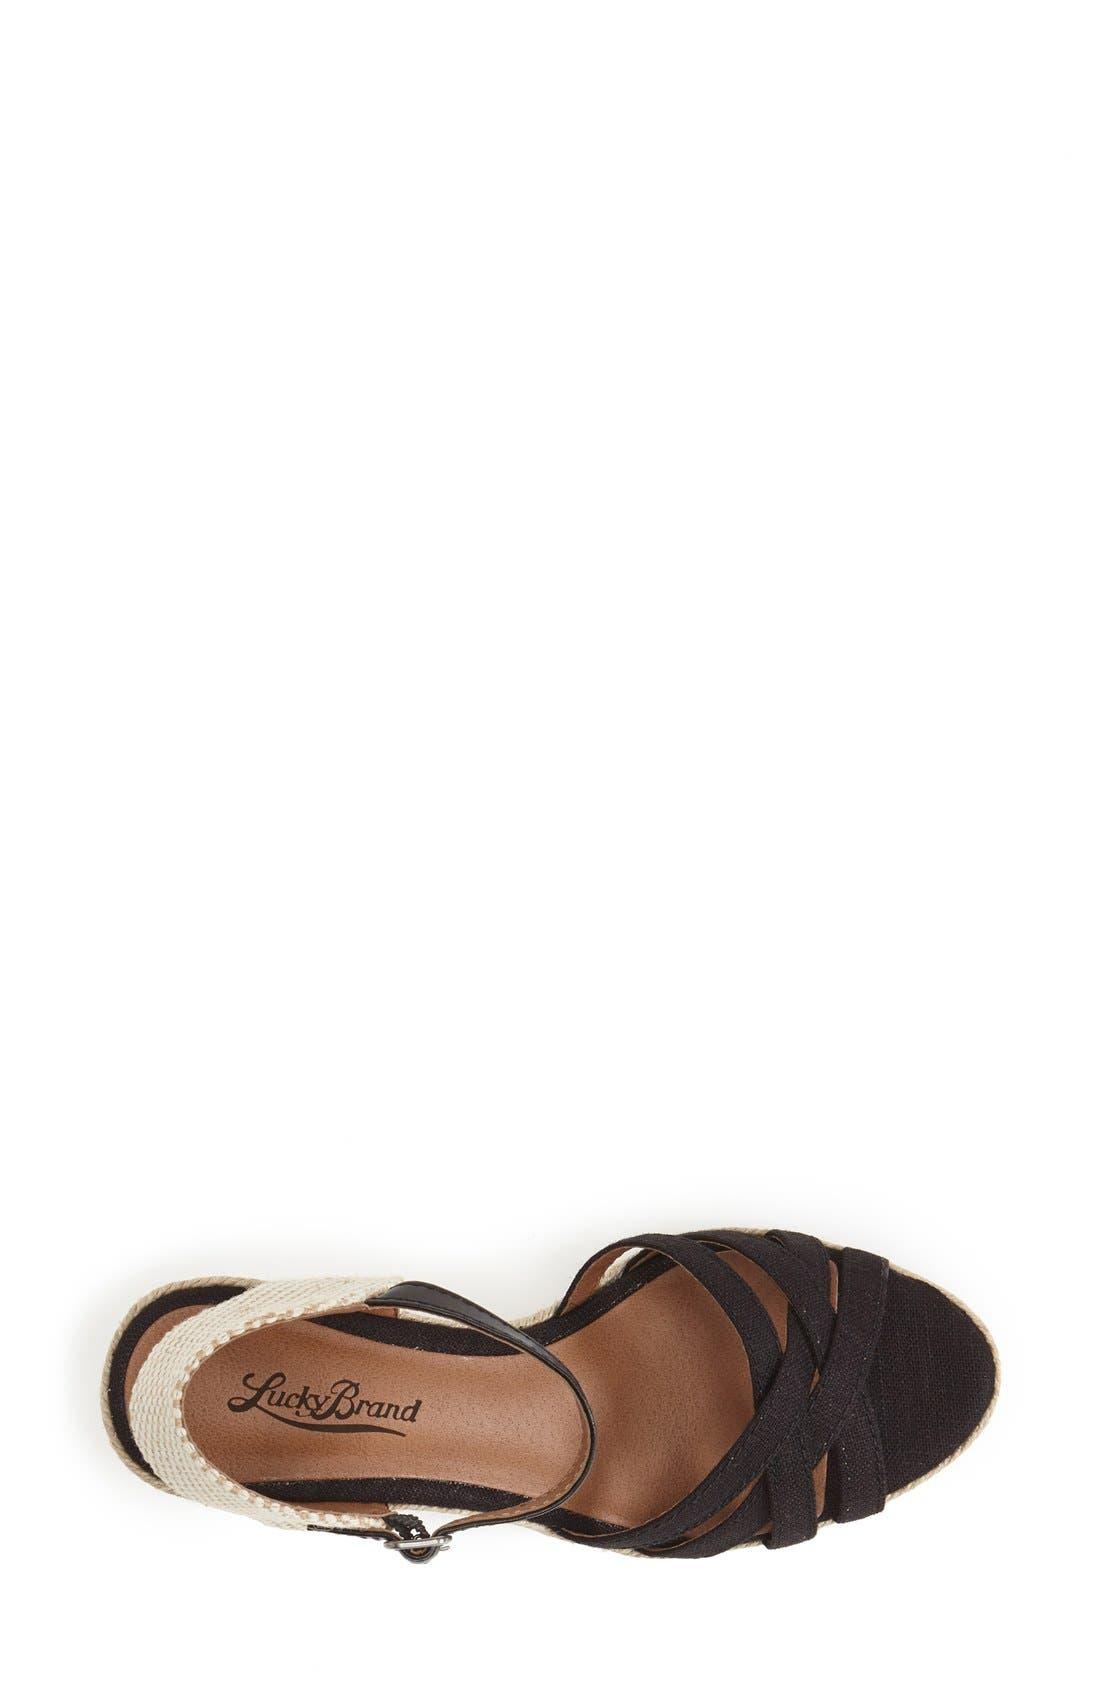 'Kalessie' Espadrille Wedge Sandal,                             Alternate thumbnail 2, color,                             001